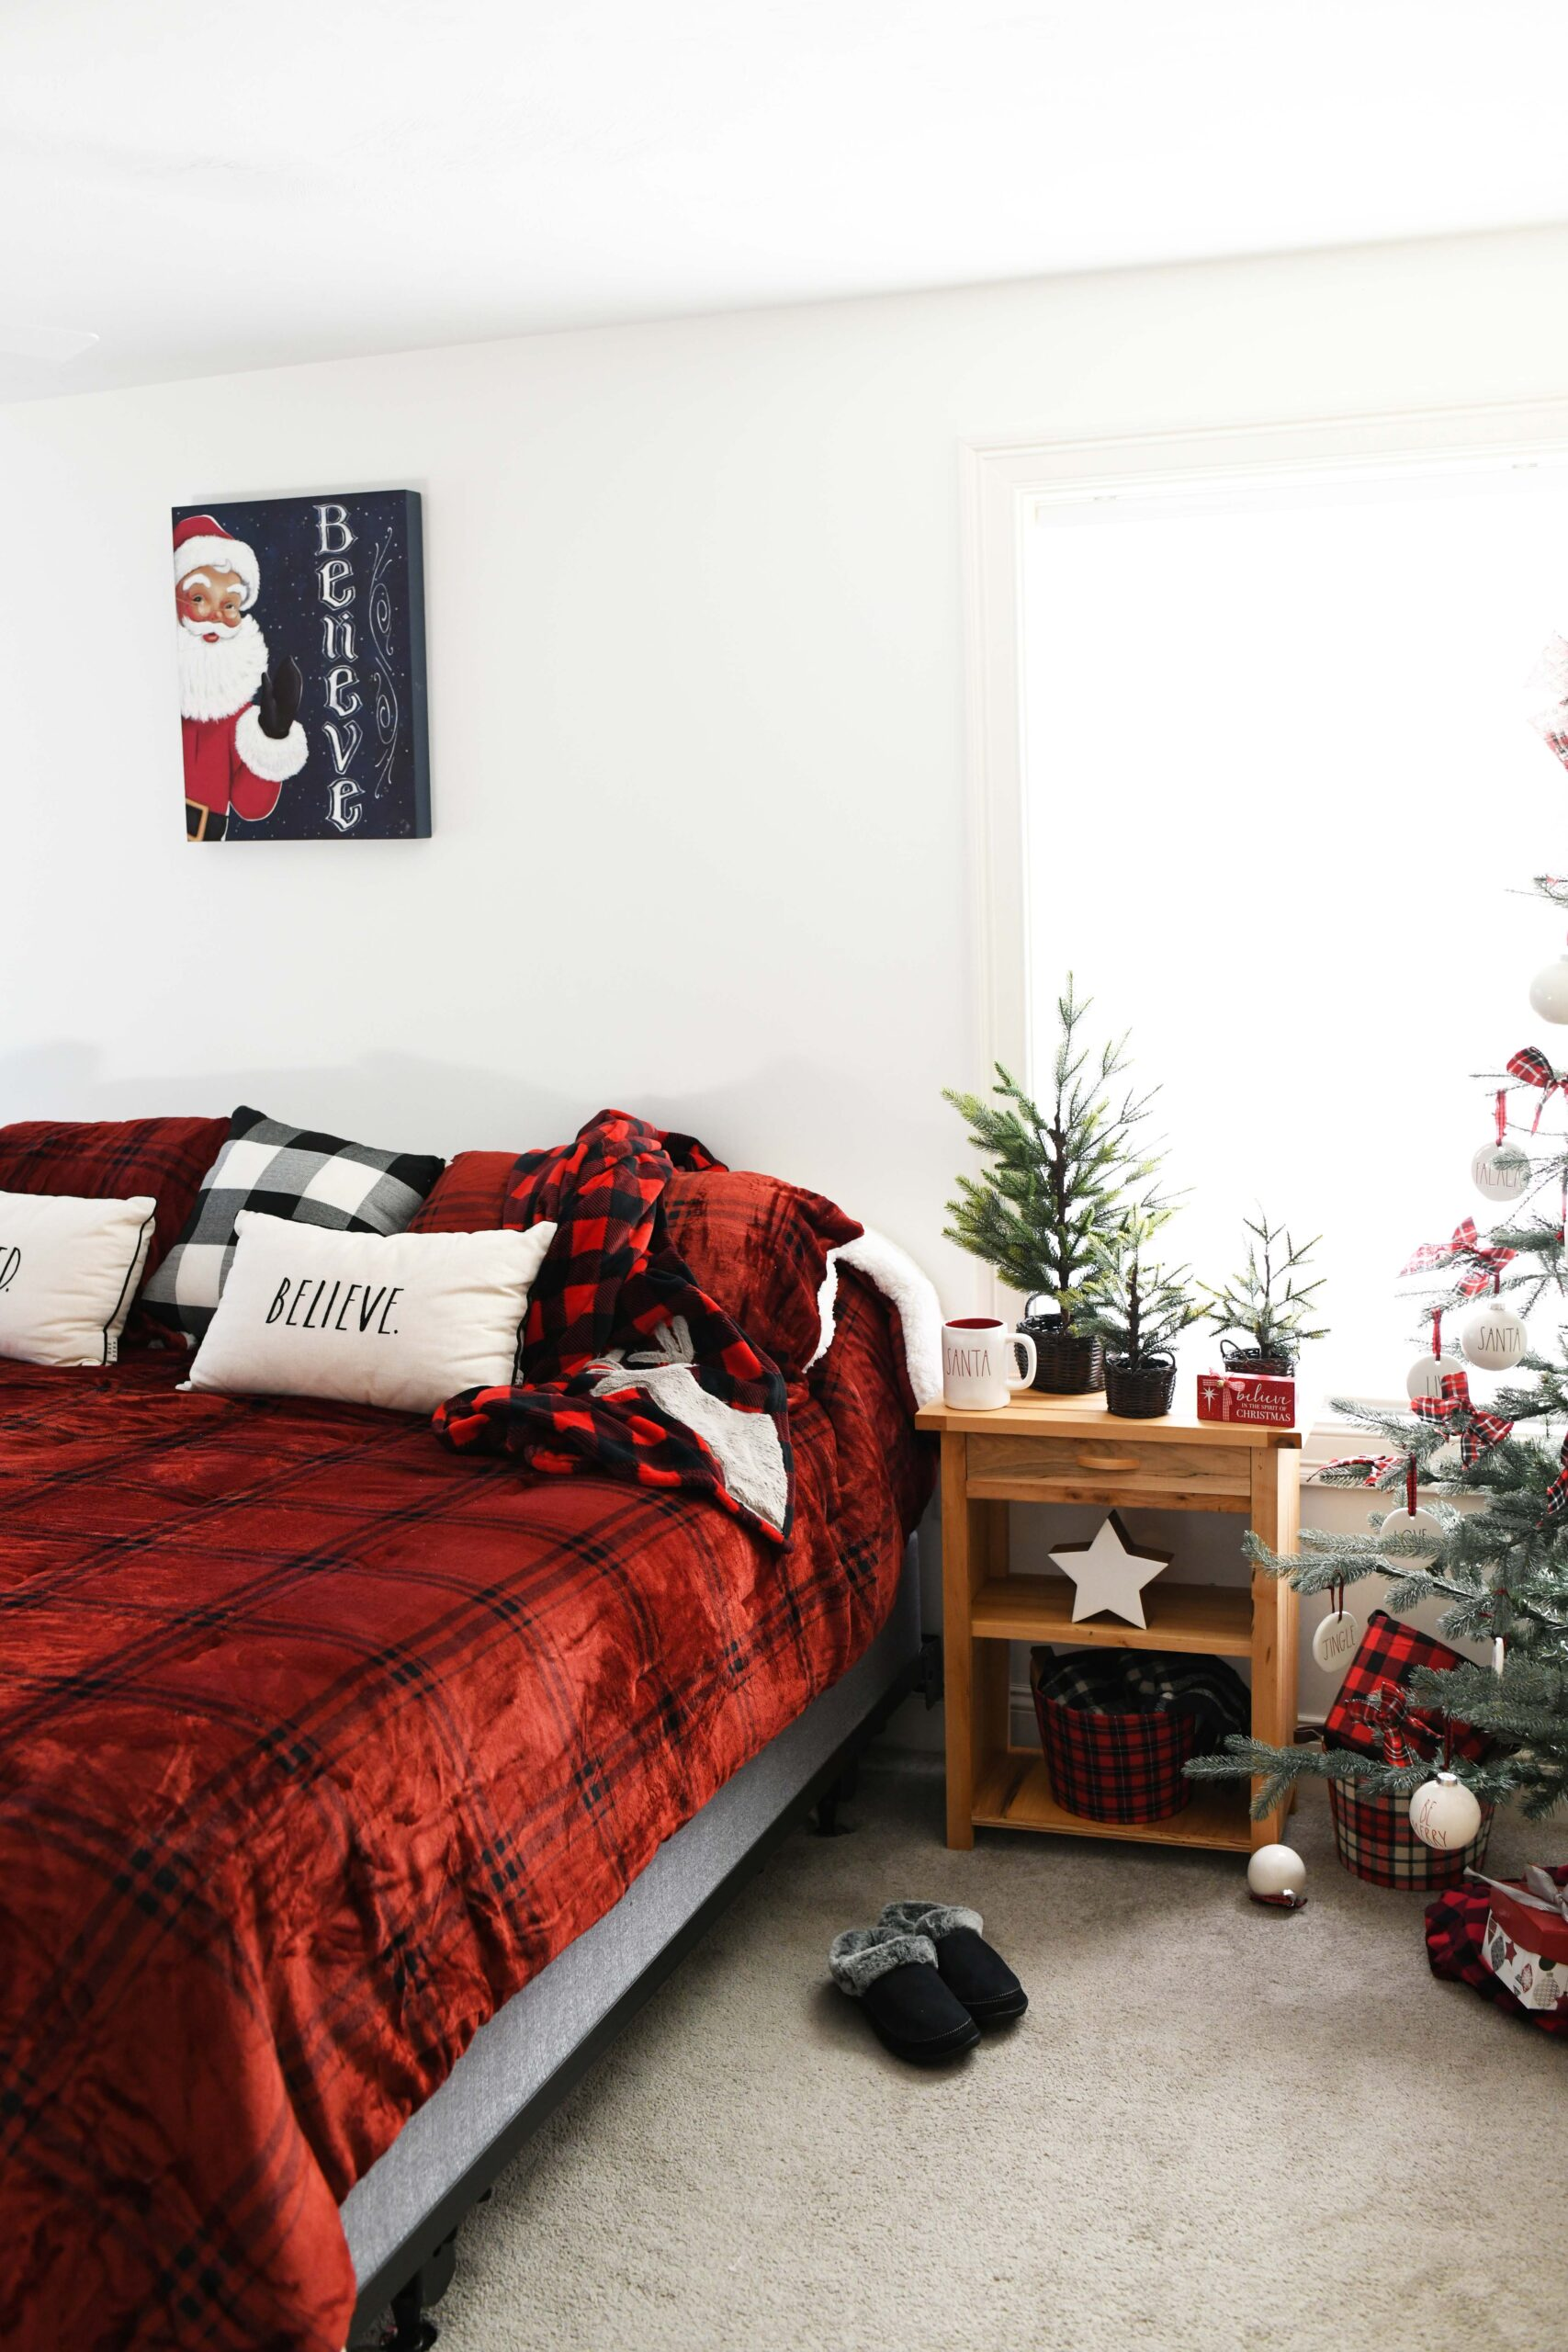 Buffalo Check Comforter in a Chrismtas bedroom setting